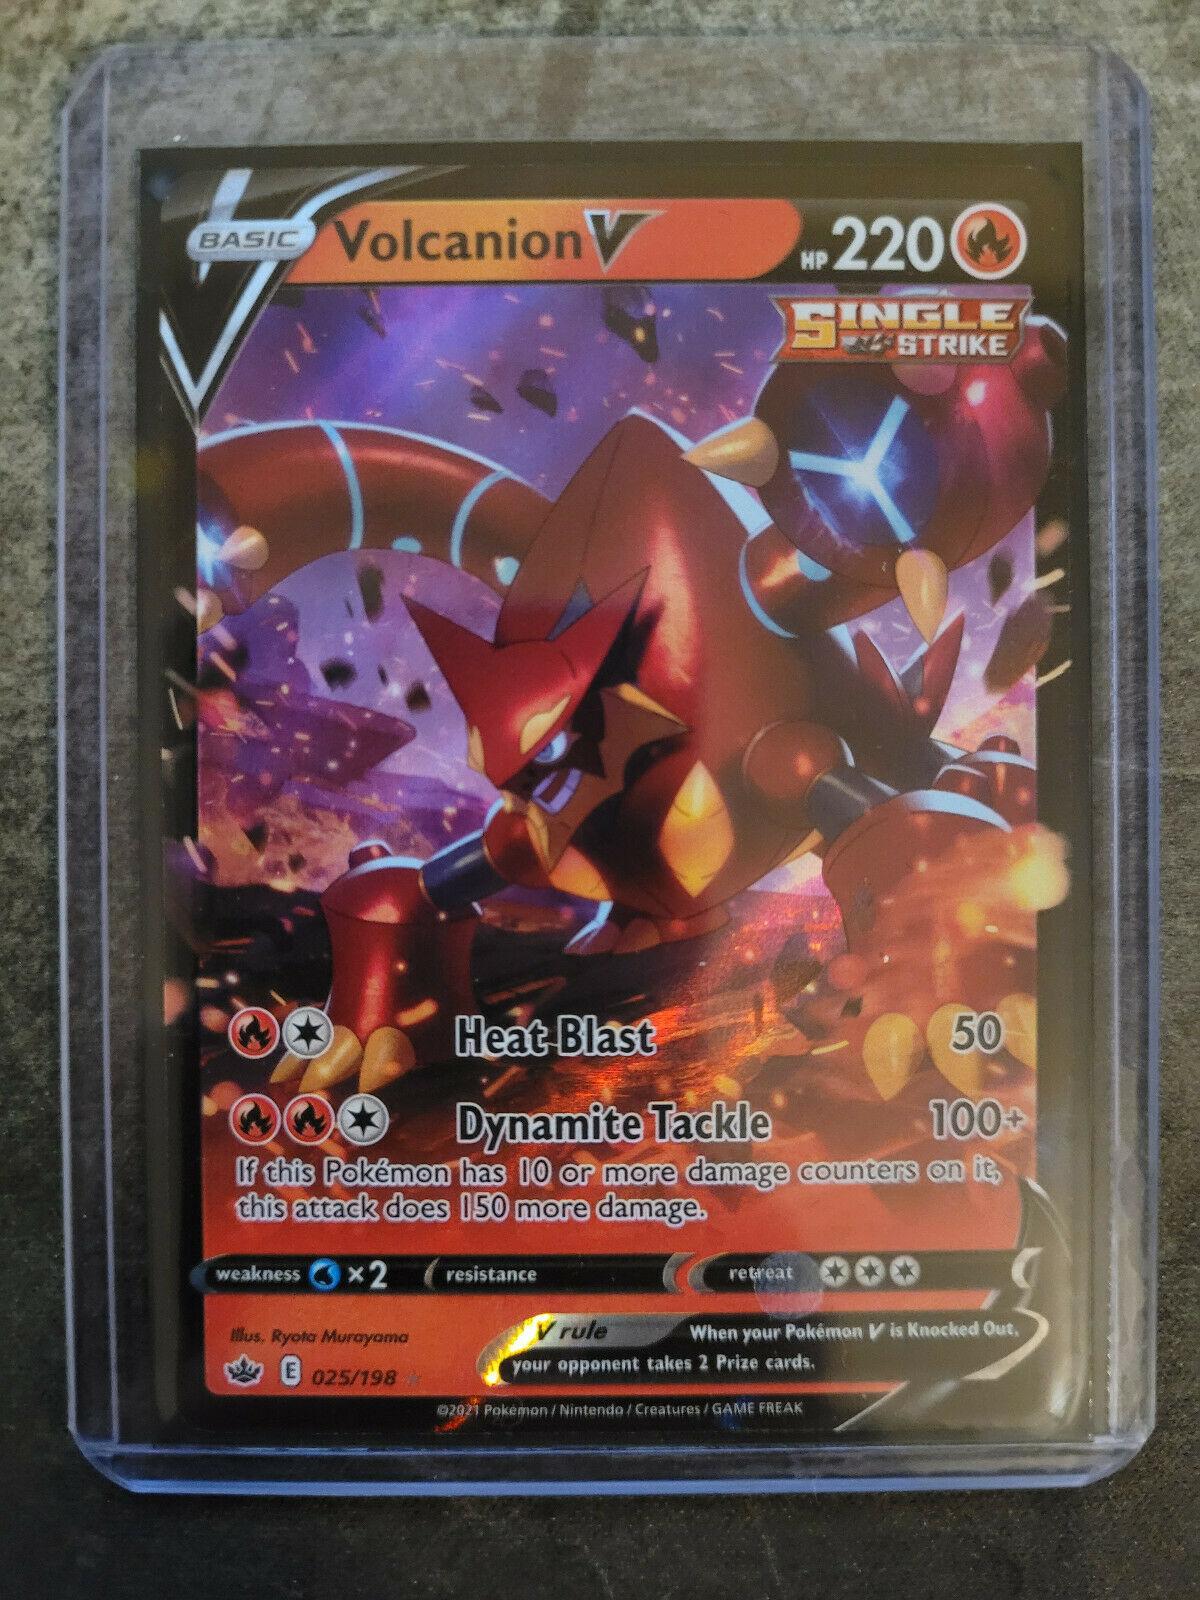 POKEMON TCG CARD Volcanion V 025/198 Chilling Reign 2021 Ultra Rare Holofoil NM